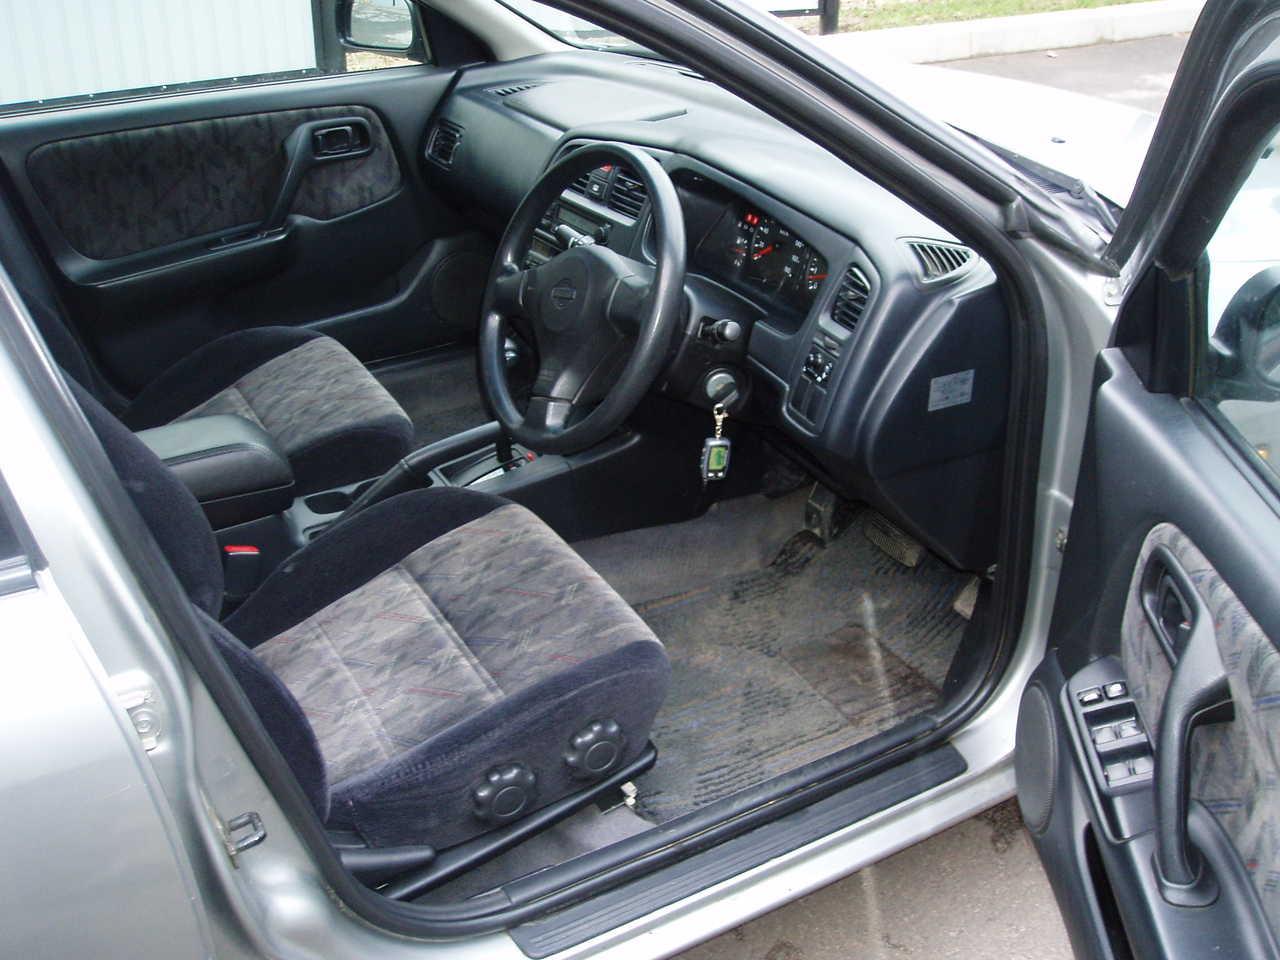 2000 Nissan Primera Camino Wagon Wallpapers 18l Gasoline Ff 1992 Infiniti G20 Problems